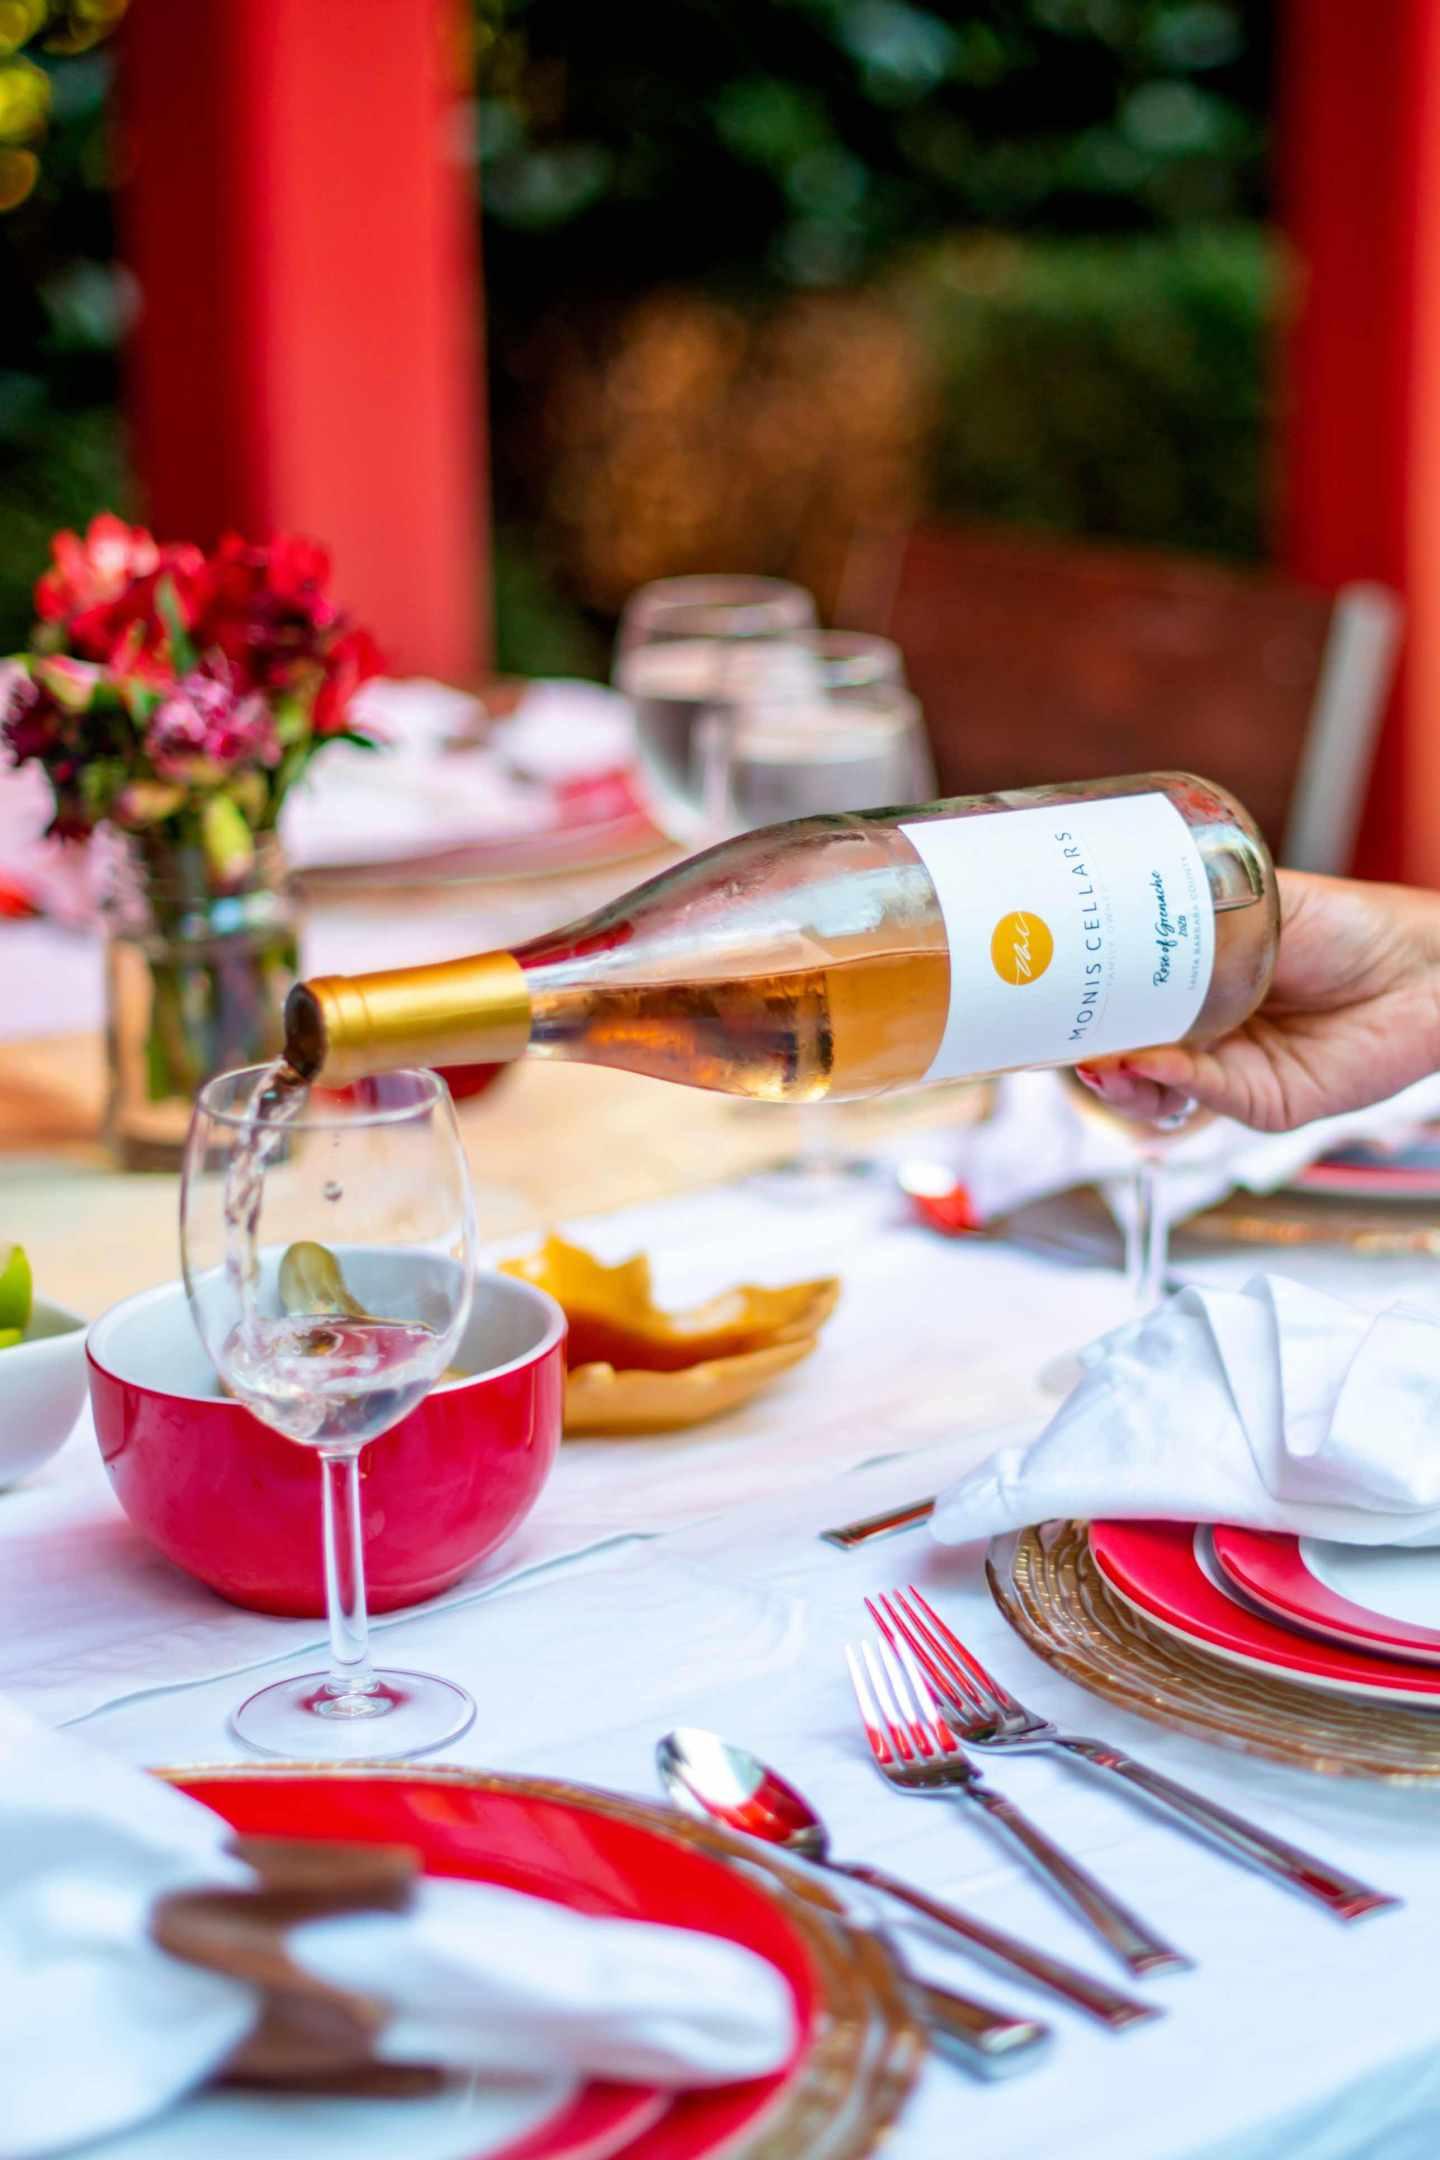 Monis Cellars Rose. Fall Dinner Party Ideas.